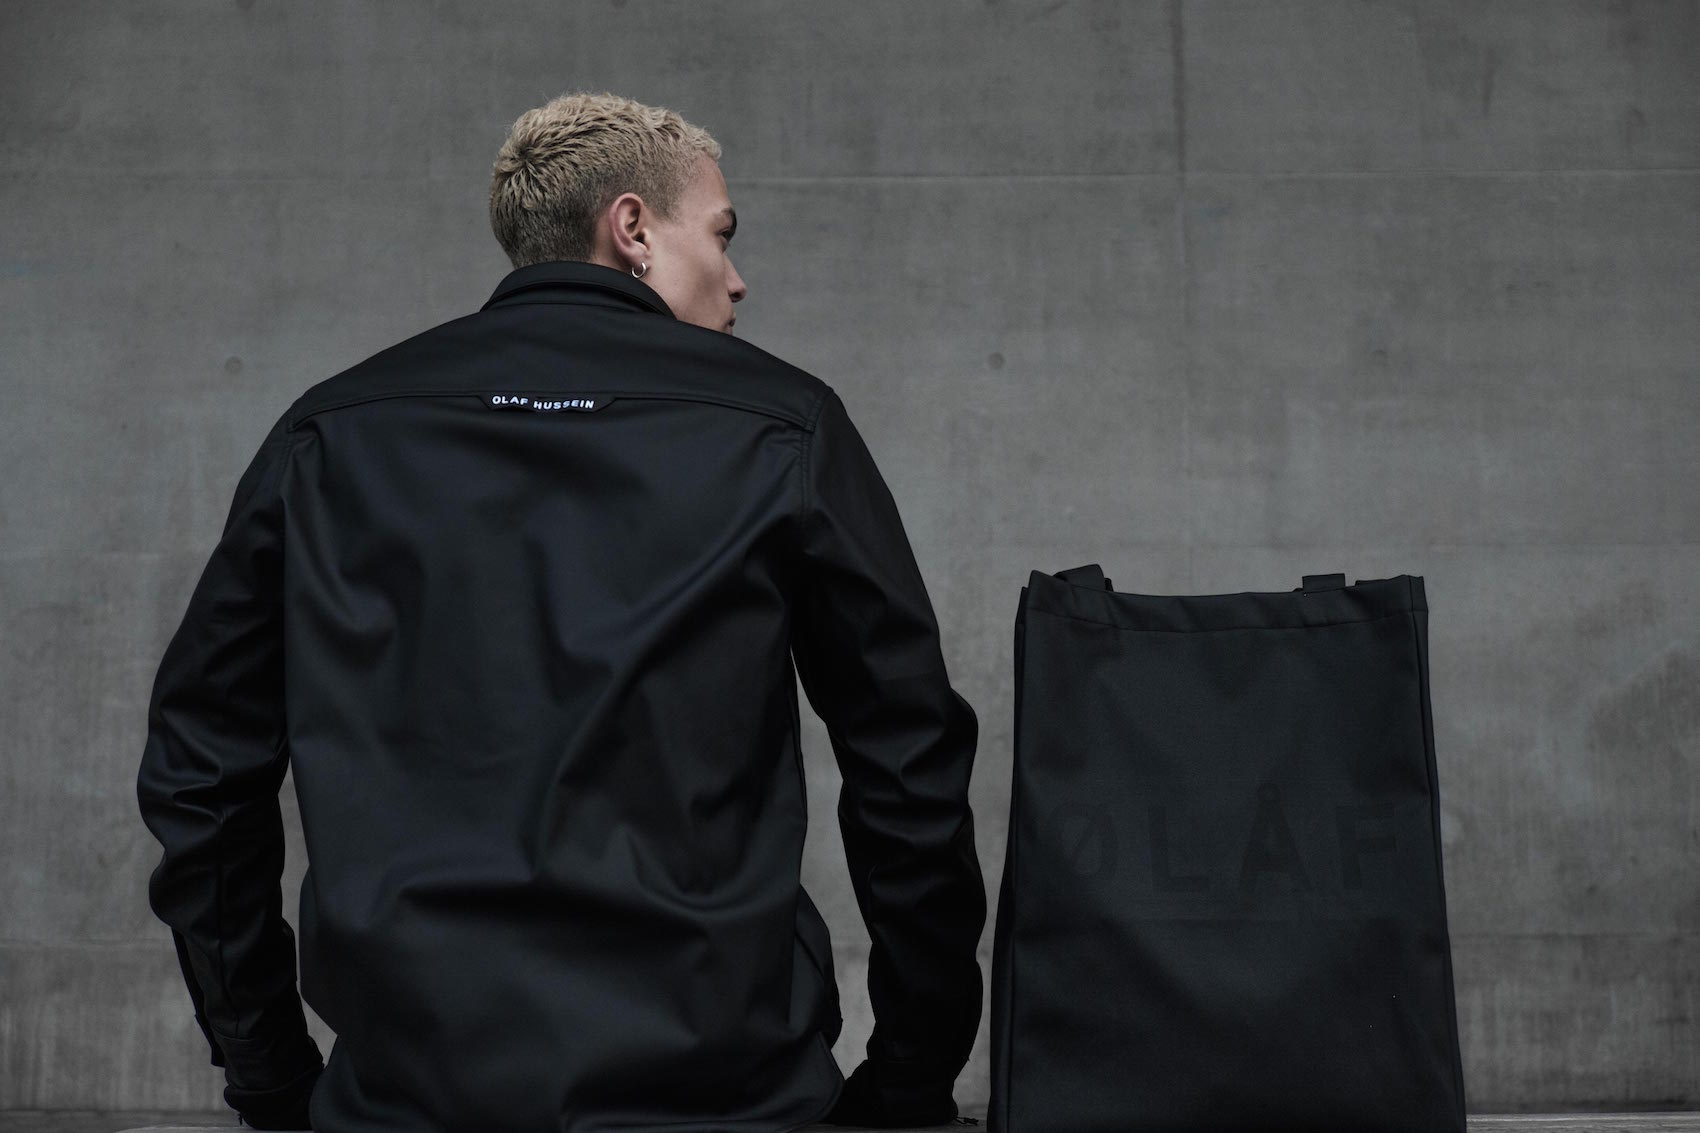 Olaf Hussein Black Jacket and Tote Bag